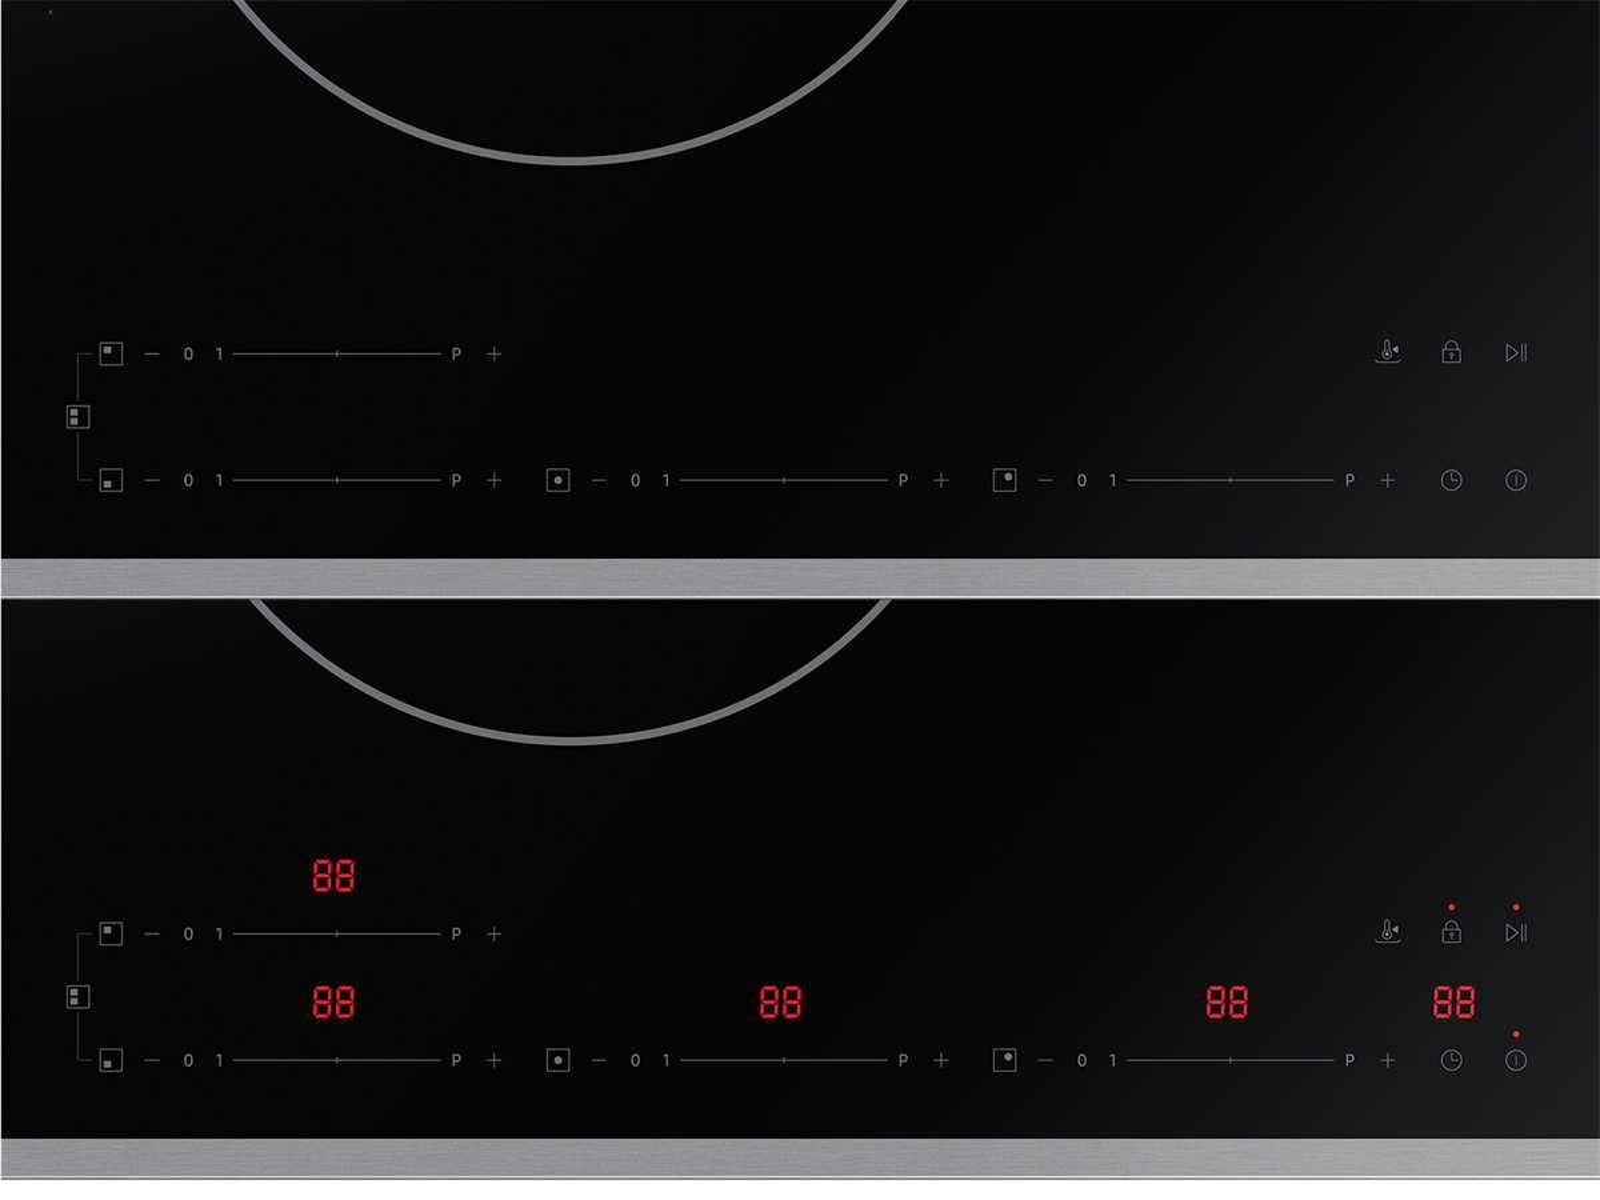 Samsung NZ84T7NC6RK/EG Induktionskochfeld autark